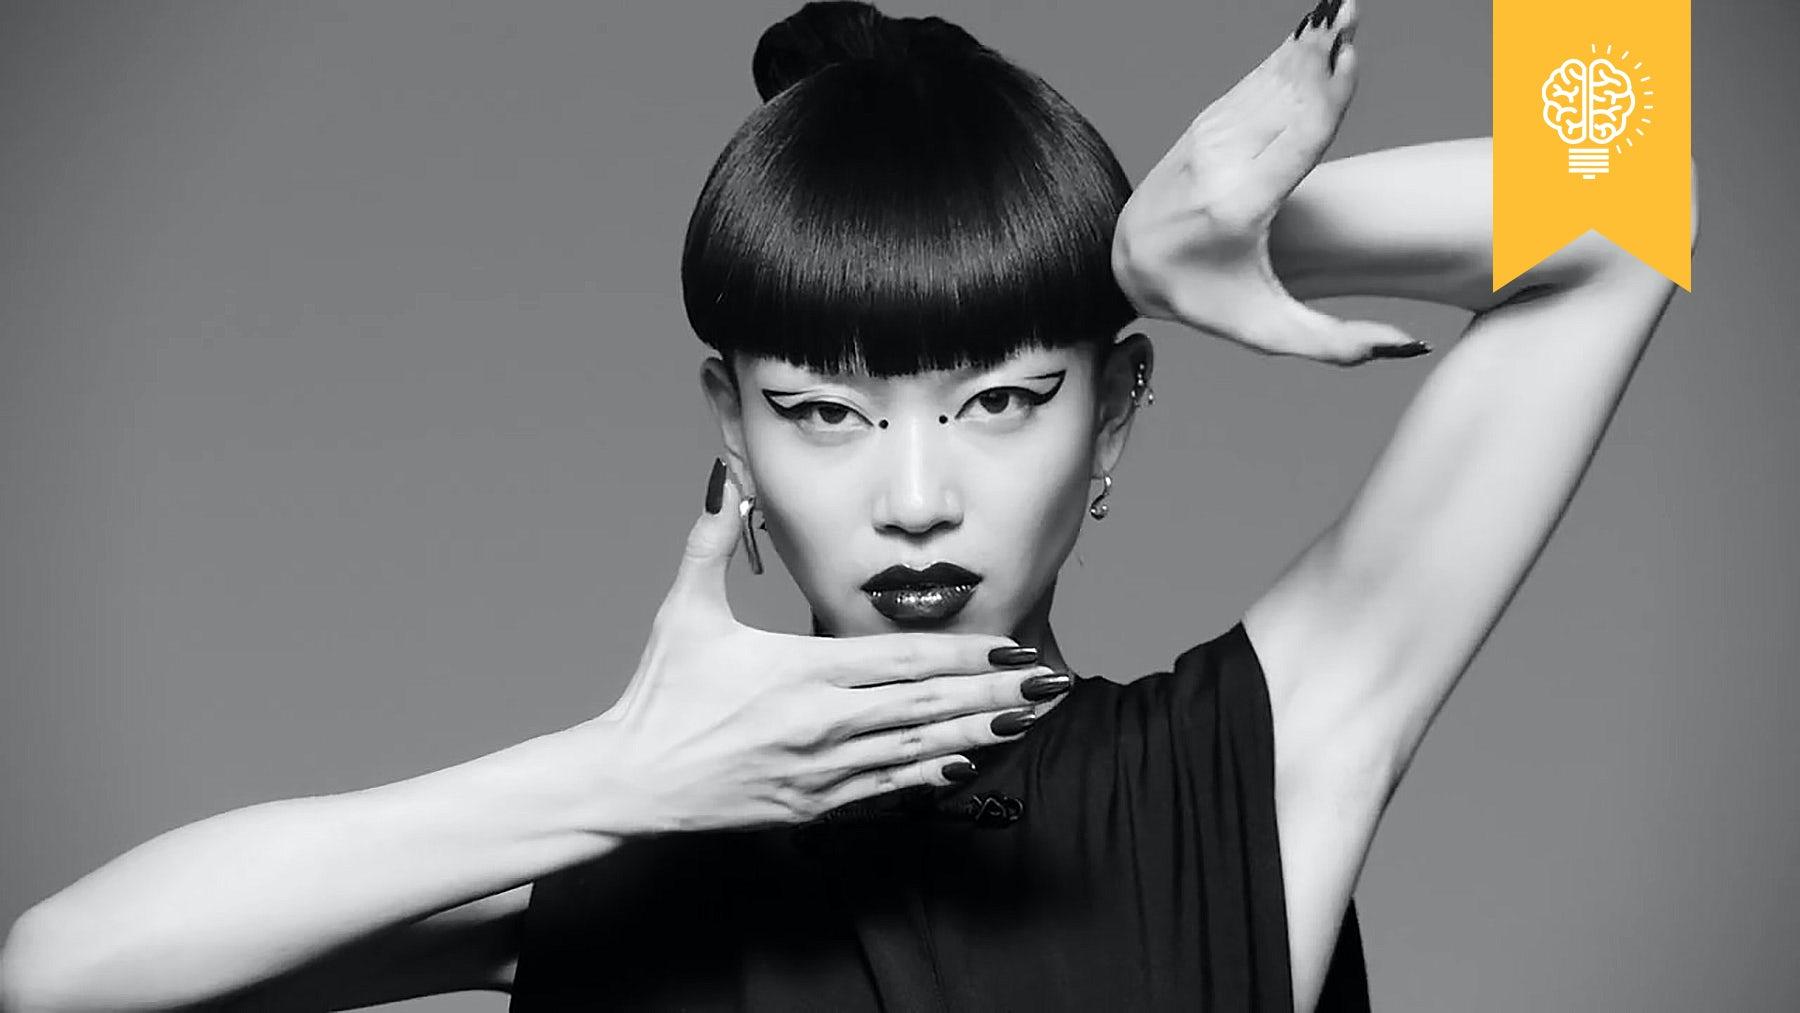 Shiseido 'Ultimune' 2017 campaign featuring Ayabambi | Source: Shiseido